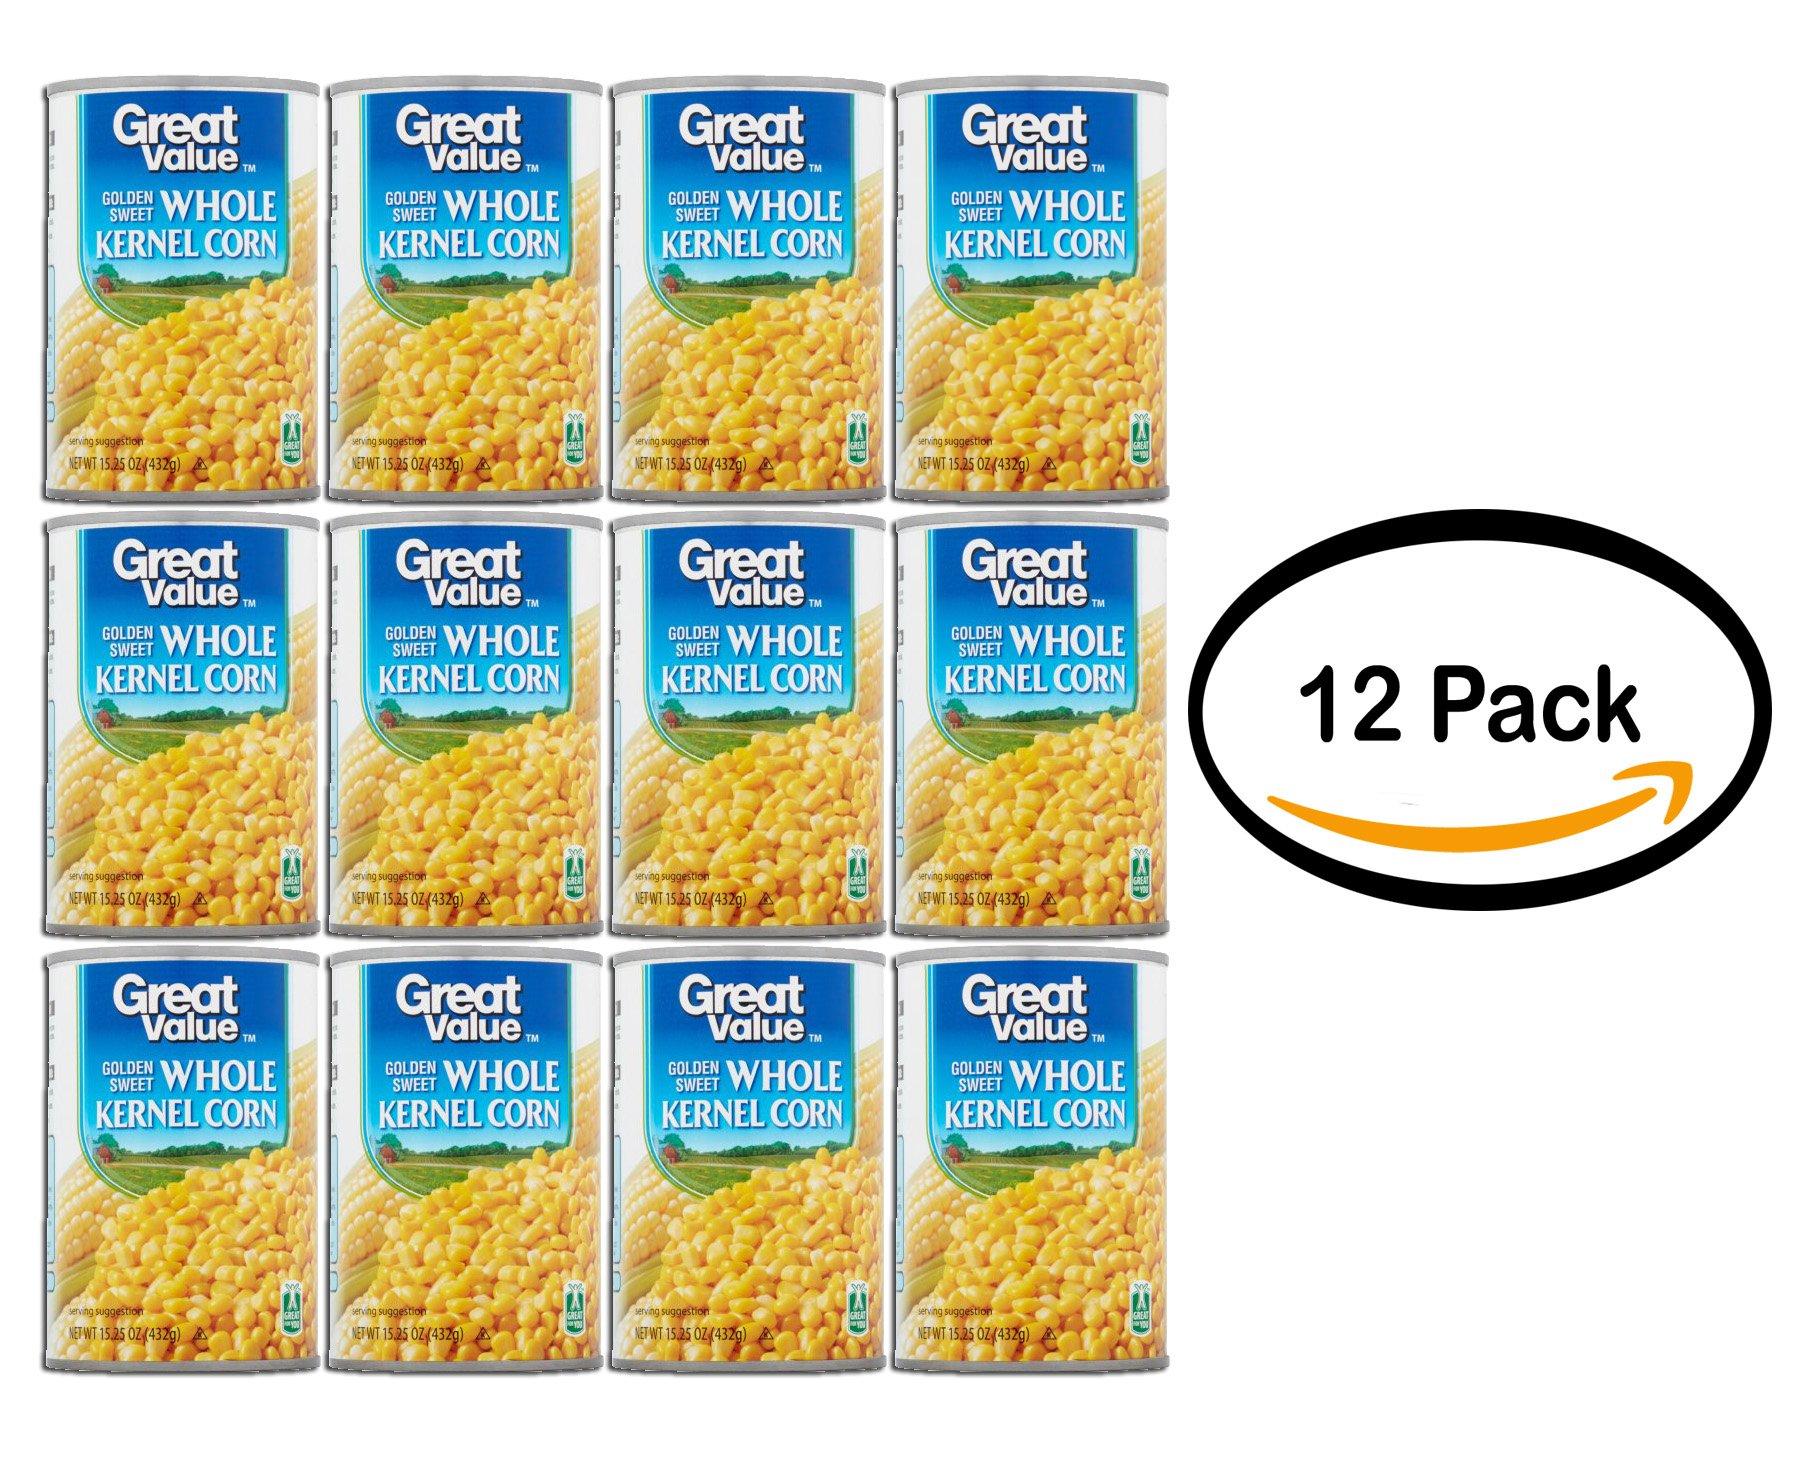 PACK OF 12 - Great Value Golden Sweet Whole Kernel Corn, 15.25 oz